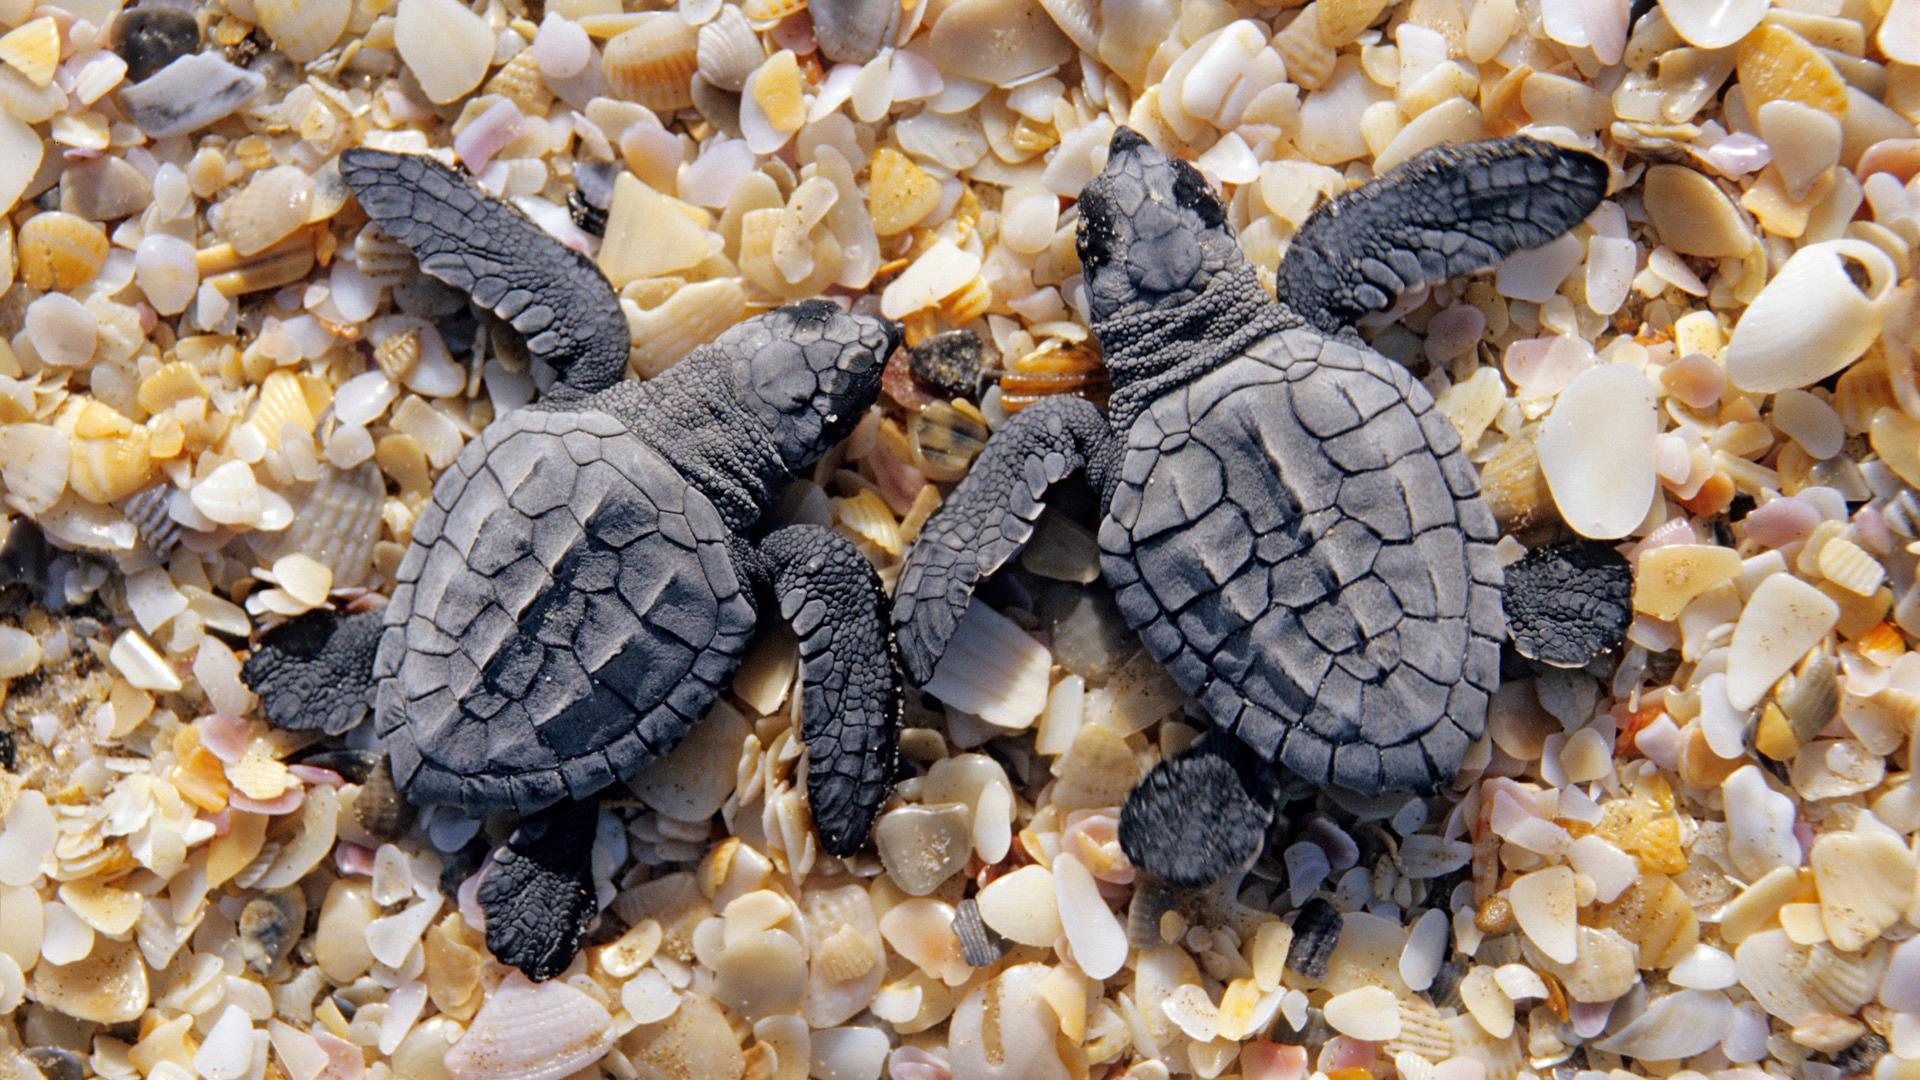 Baby Turtles Wallpaper